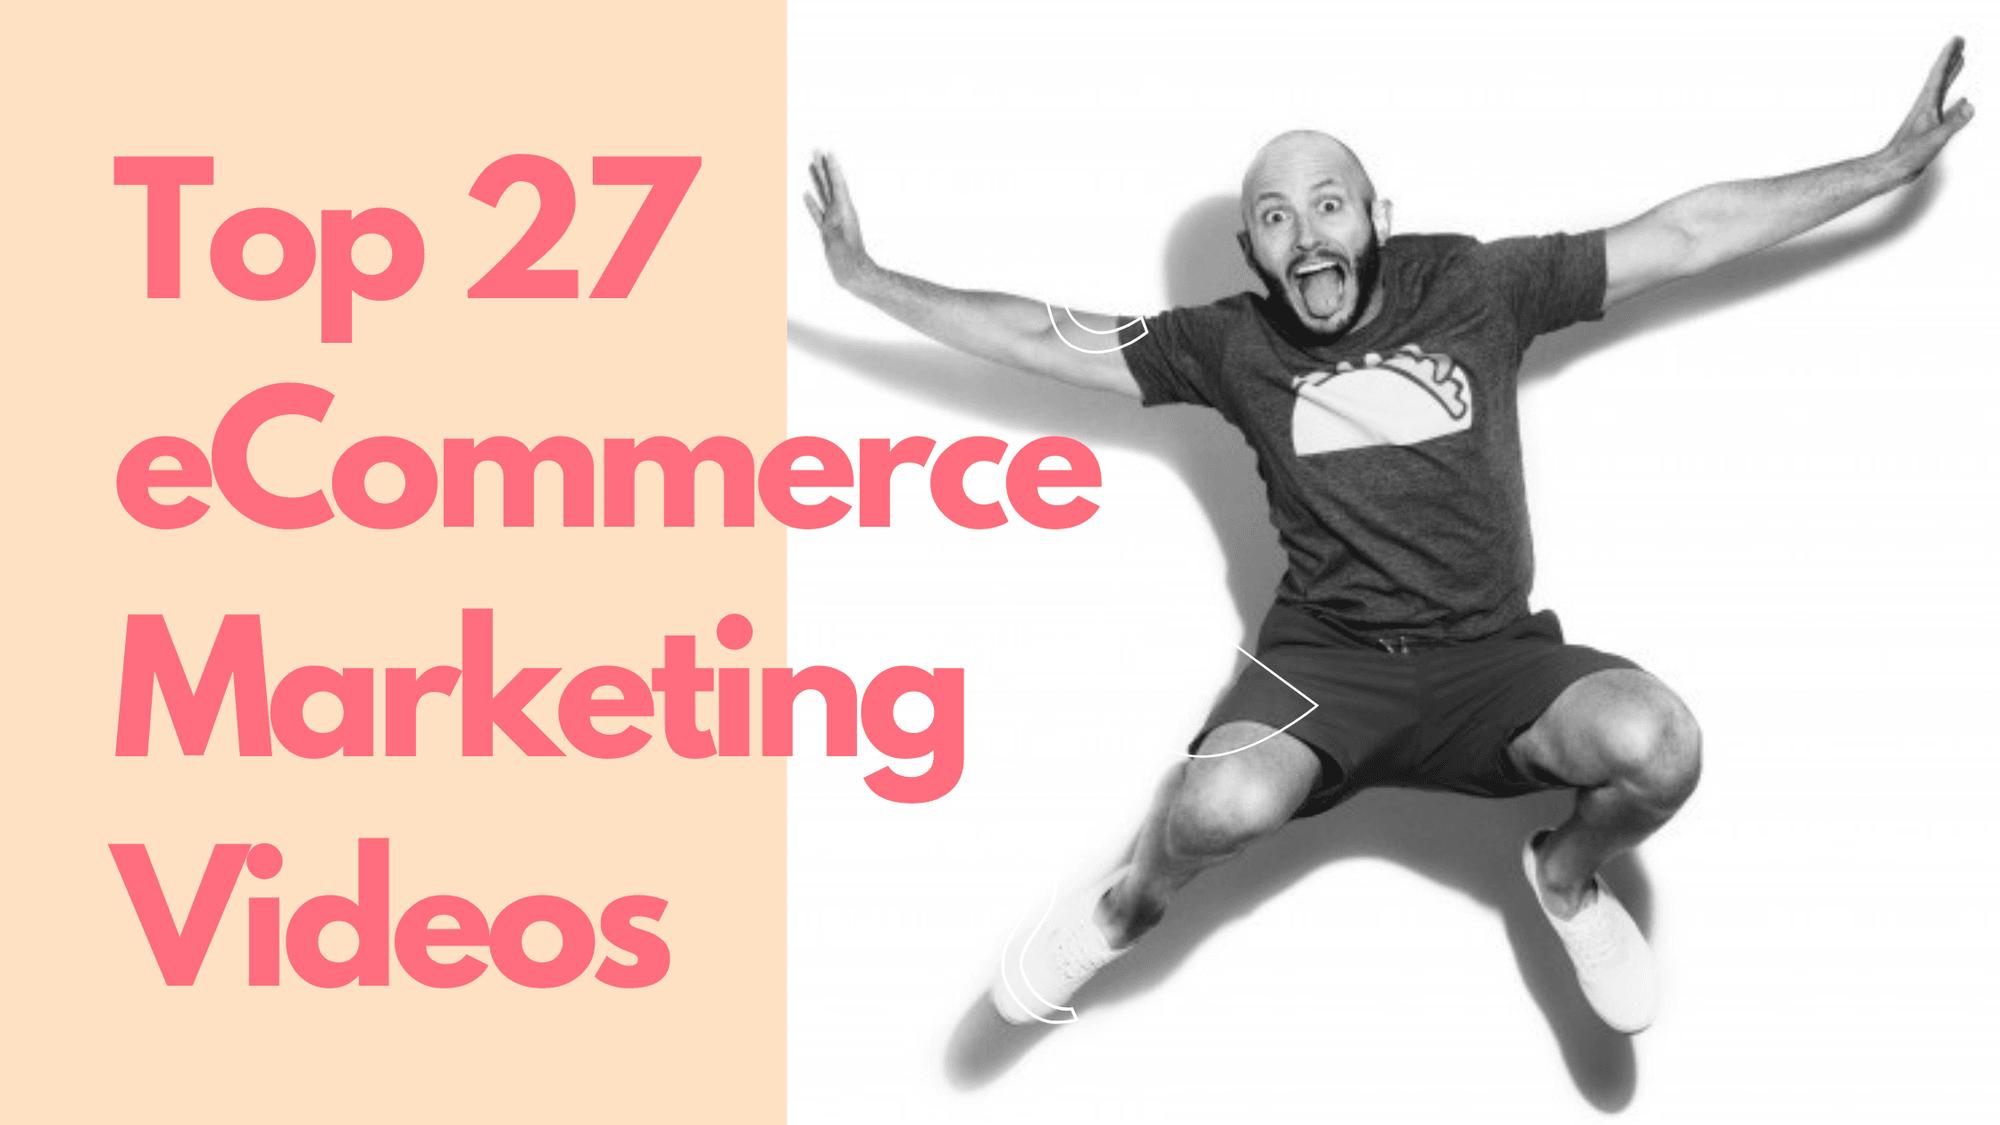 Top 27 ecommerce marketing videos